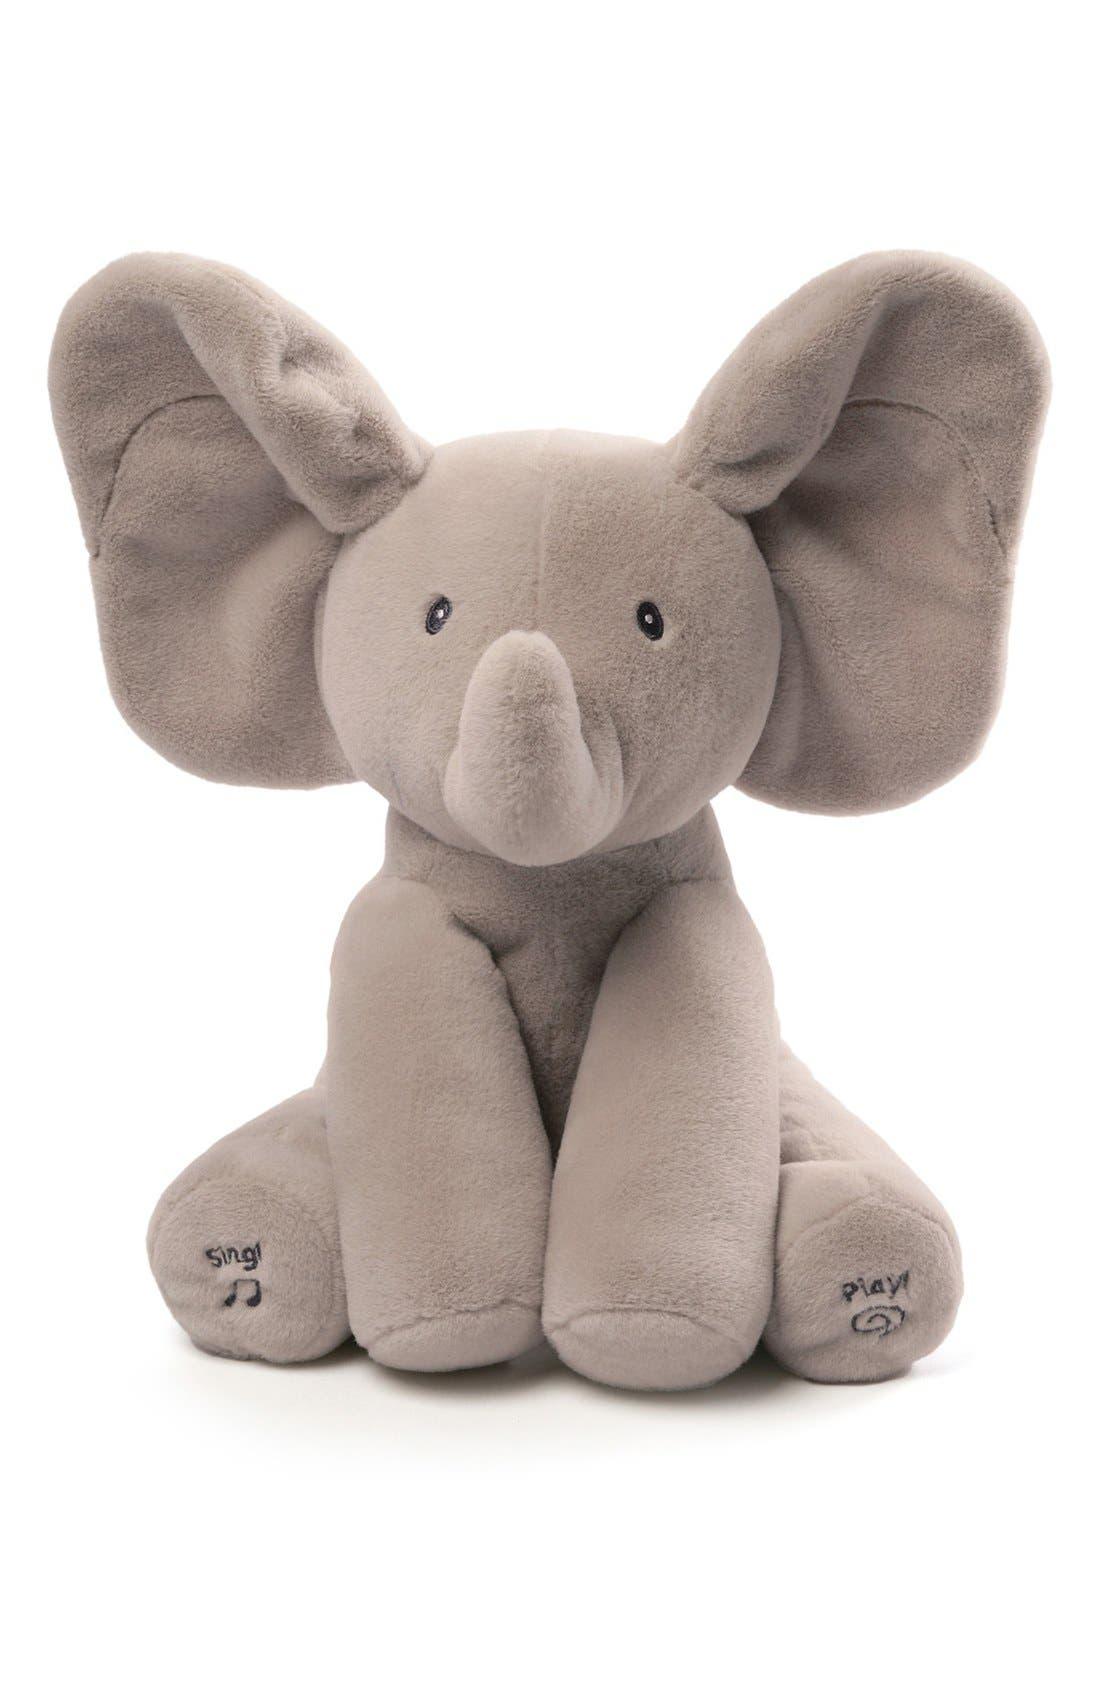 Alternate Image 1 Selected - Baby Gund 'Flappy The Elephant' Musical Elephant